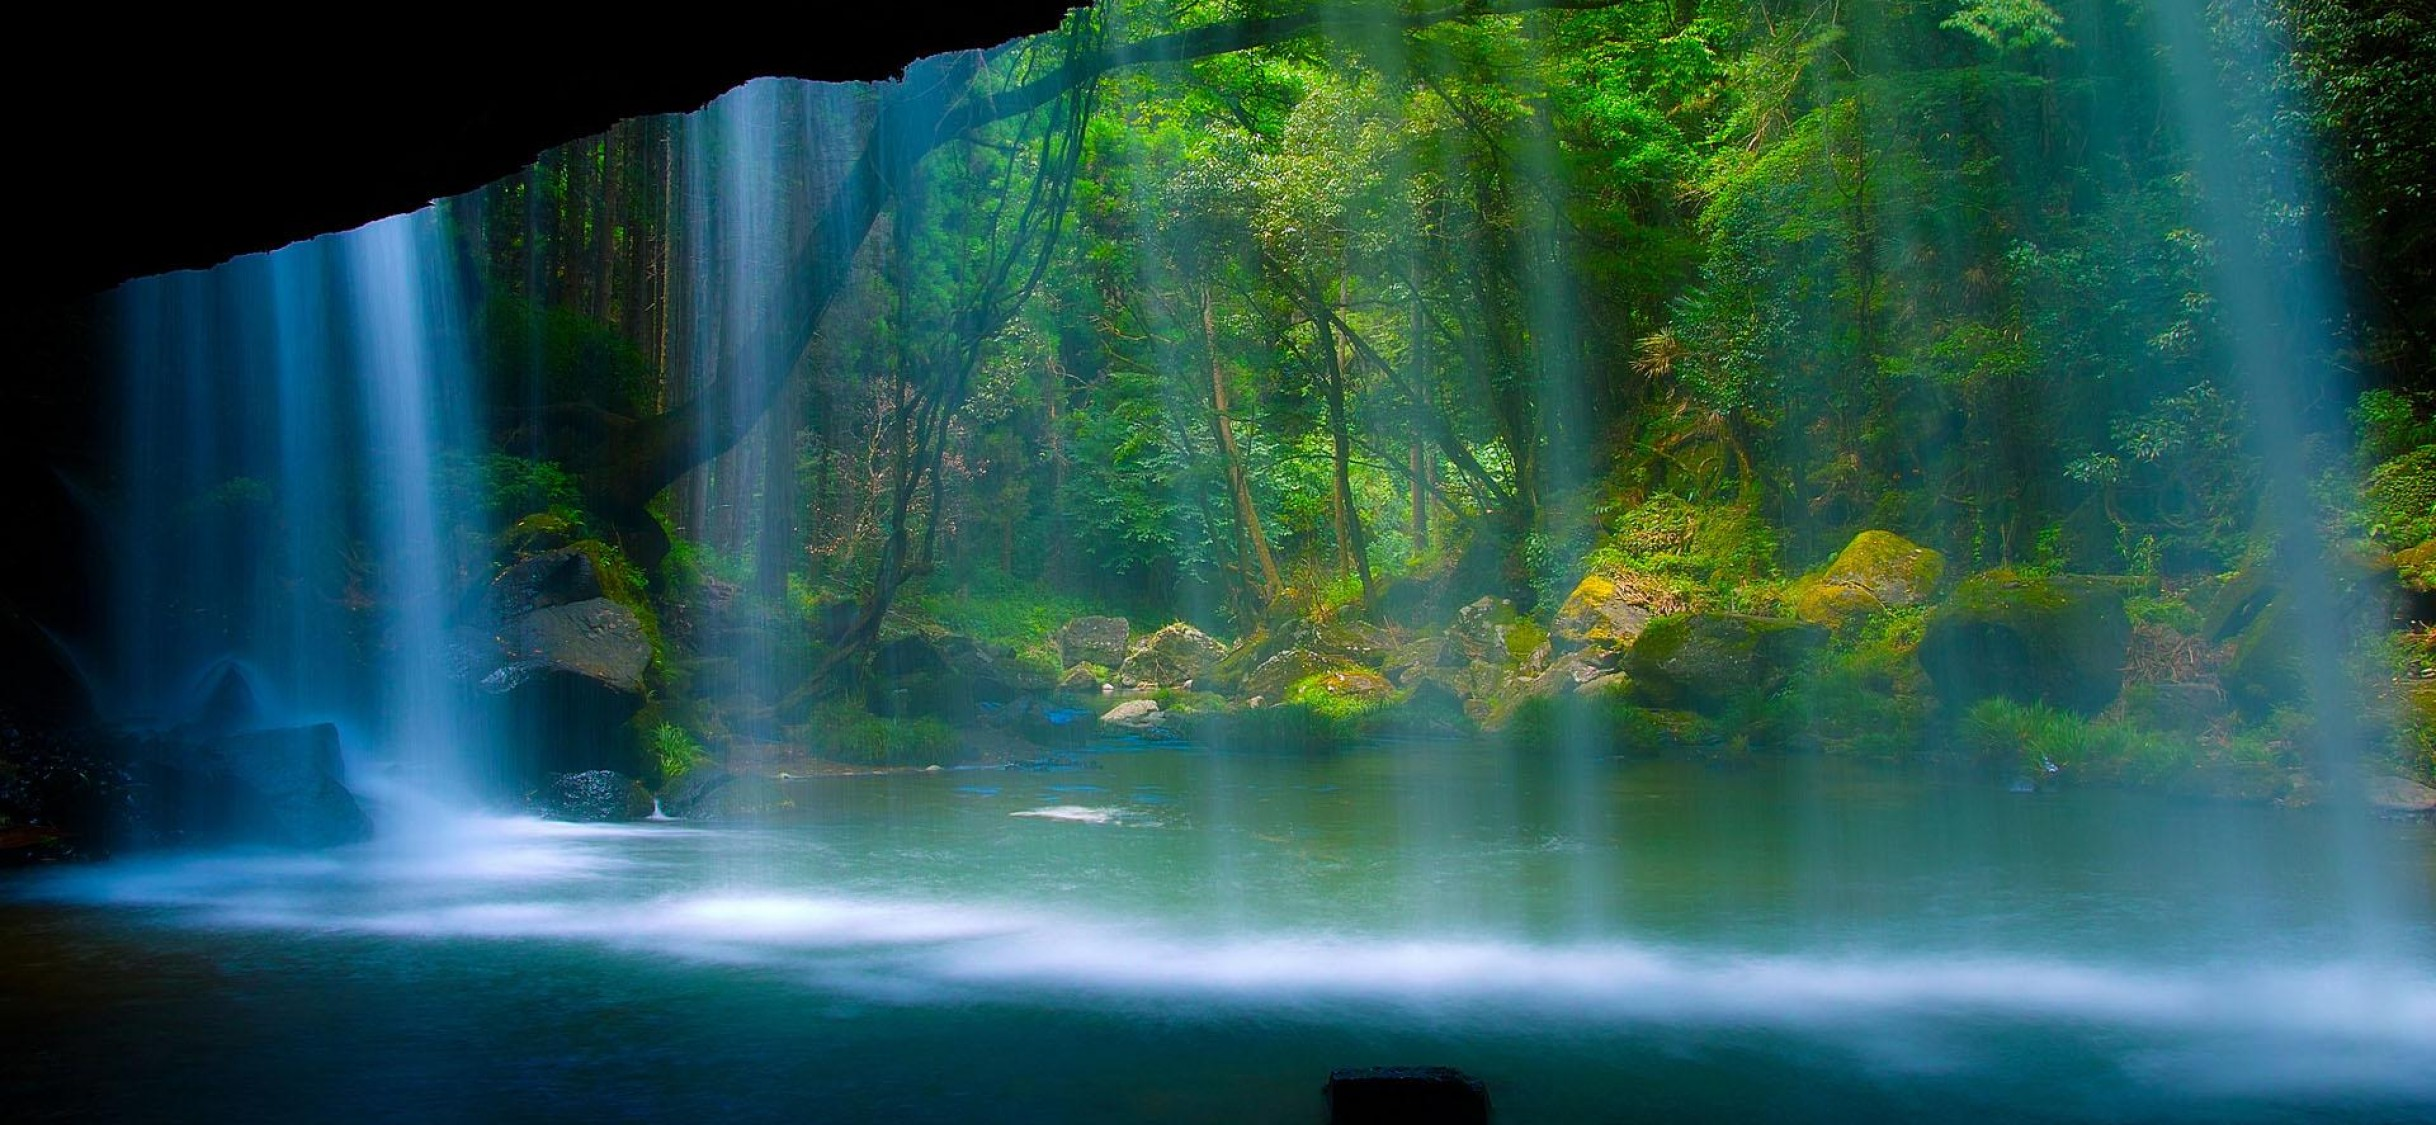 Download Free Rainforest Waterfall Full Hd Wallpaper Iphone X Hd